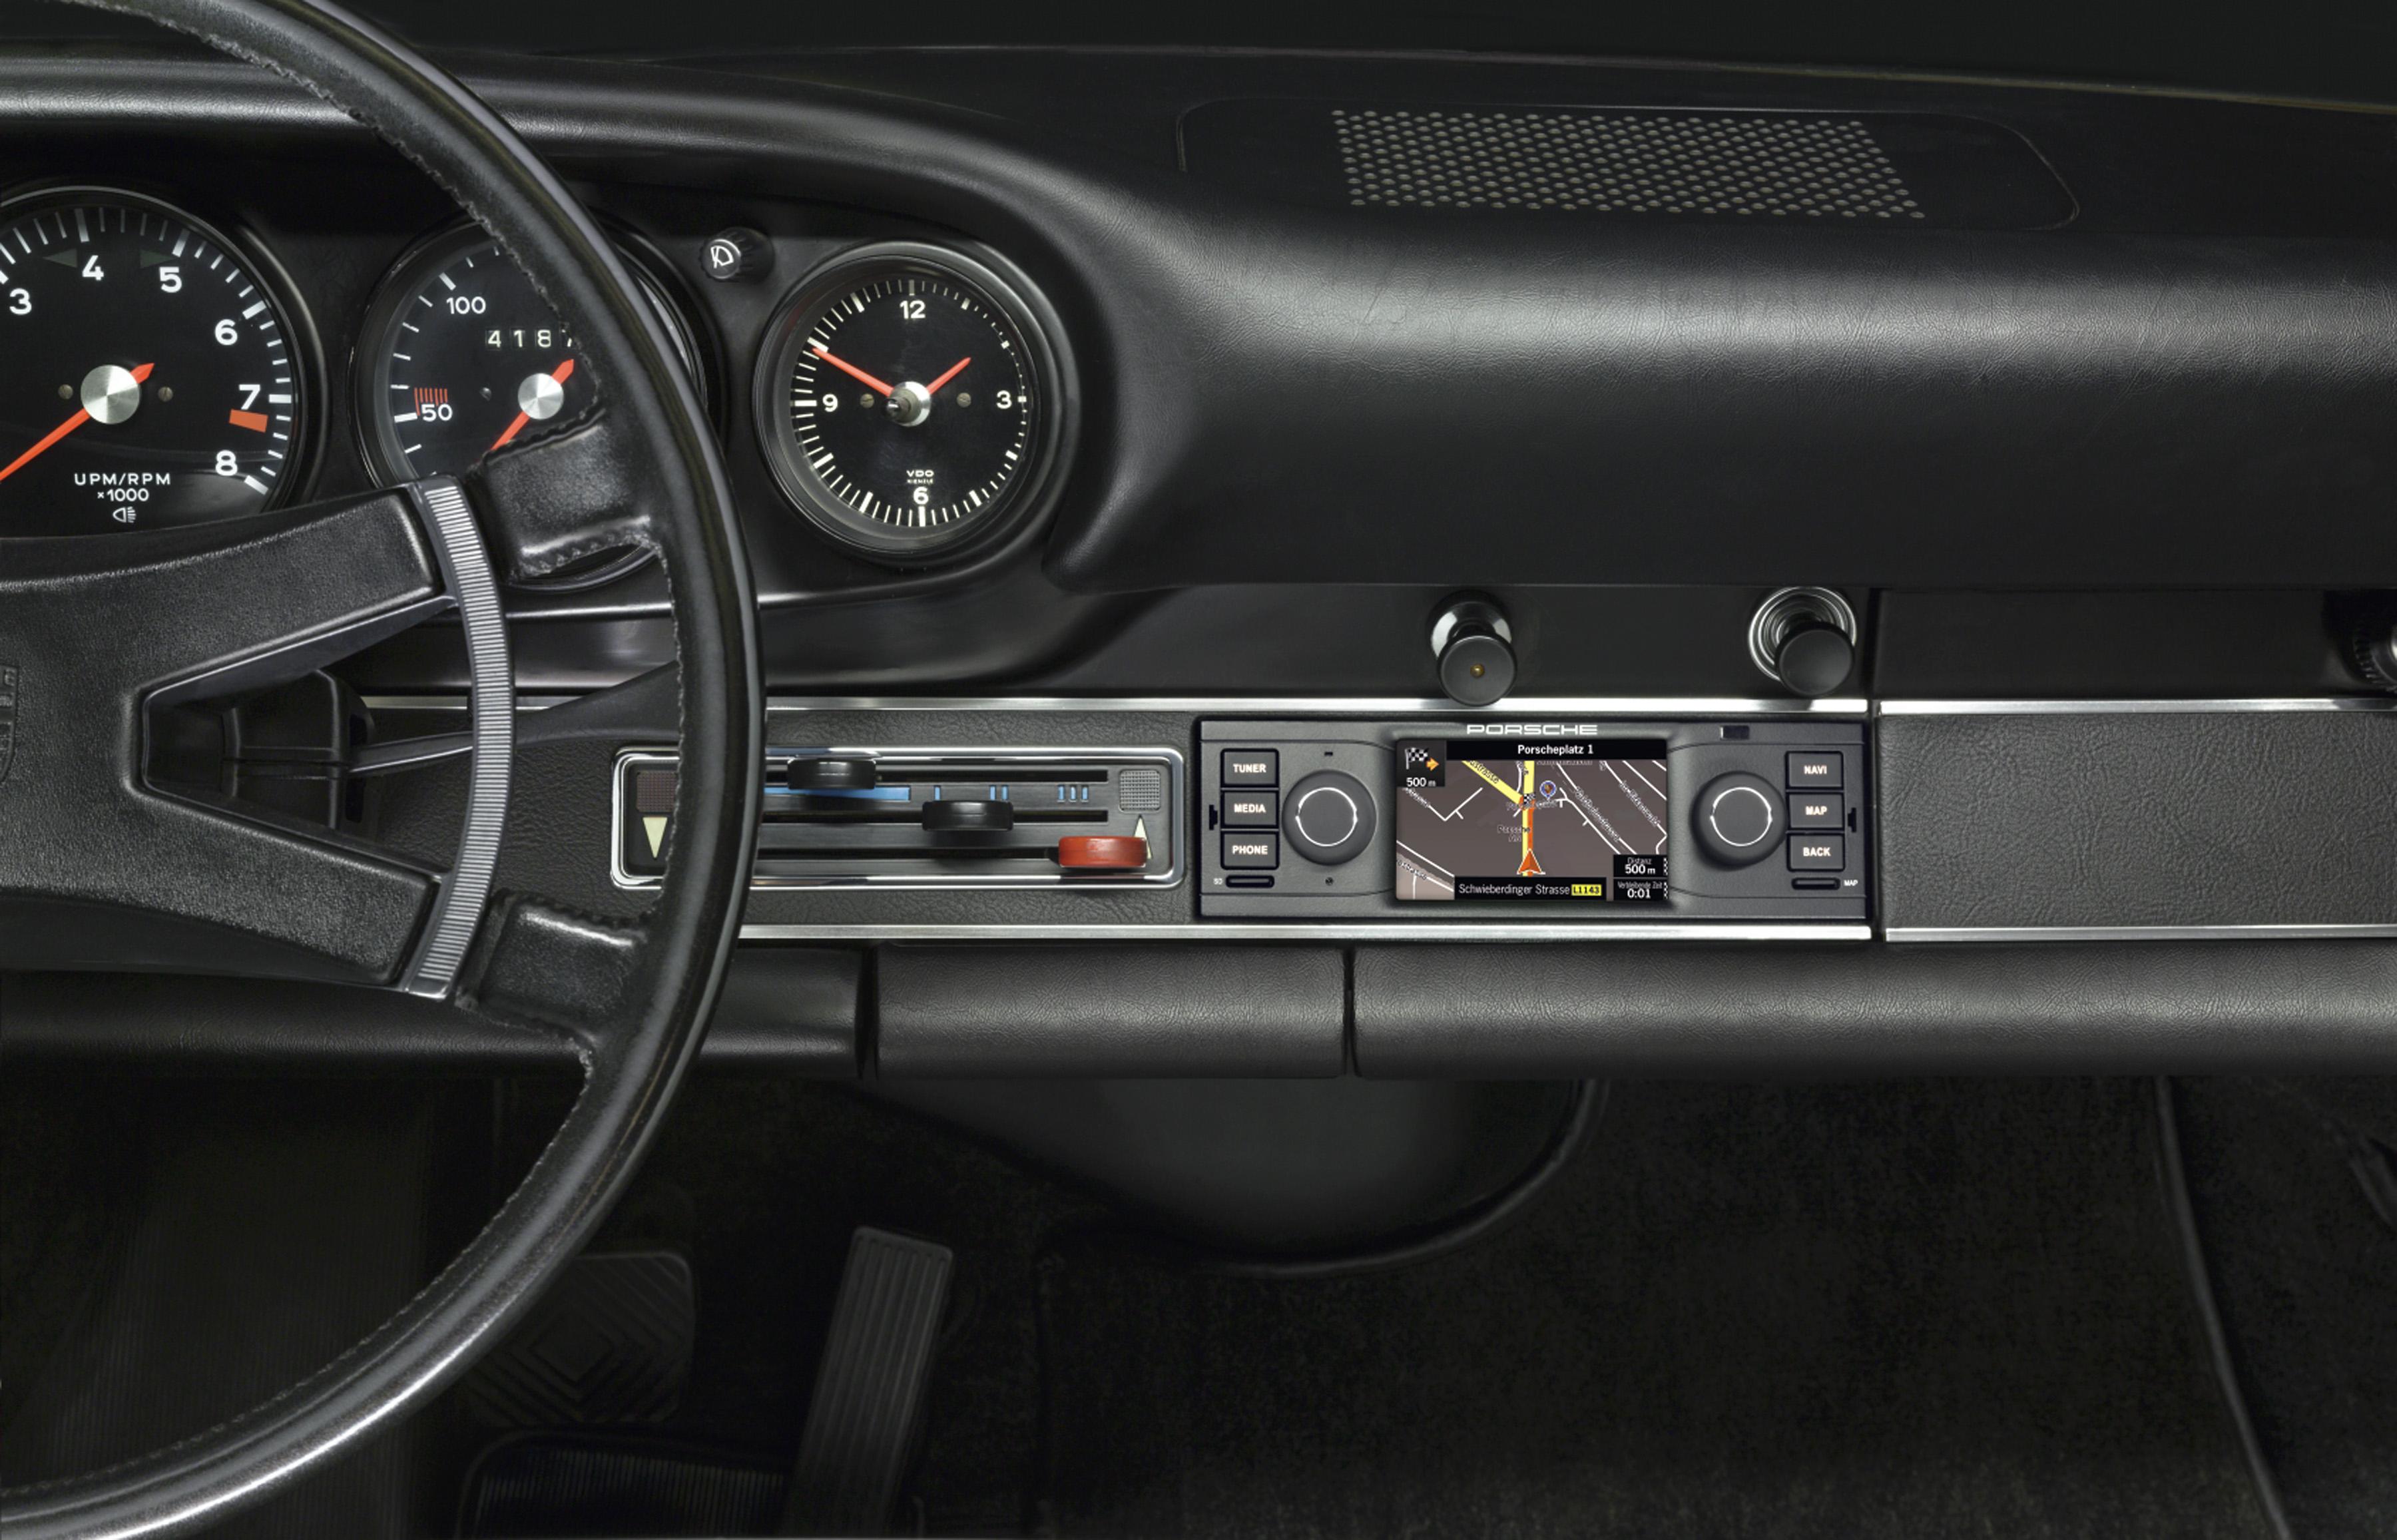 New porsche classic radio navigation system